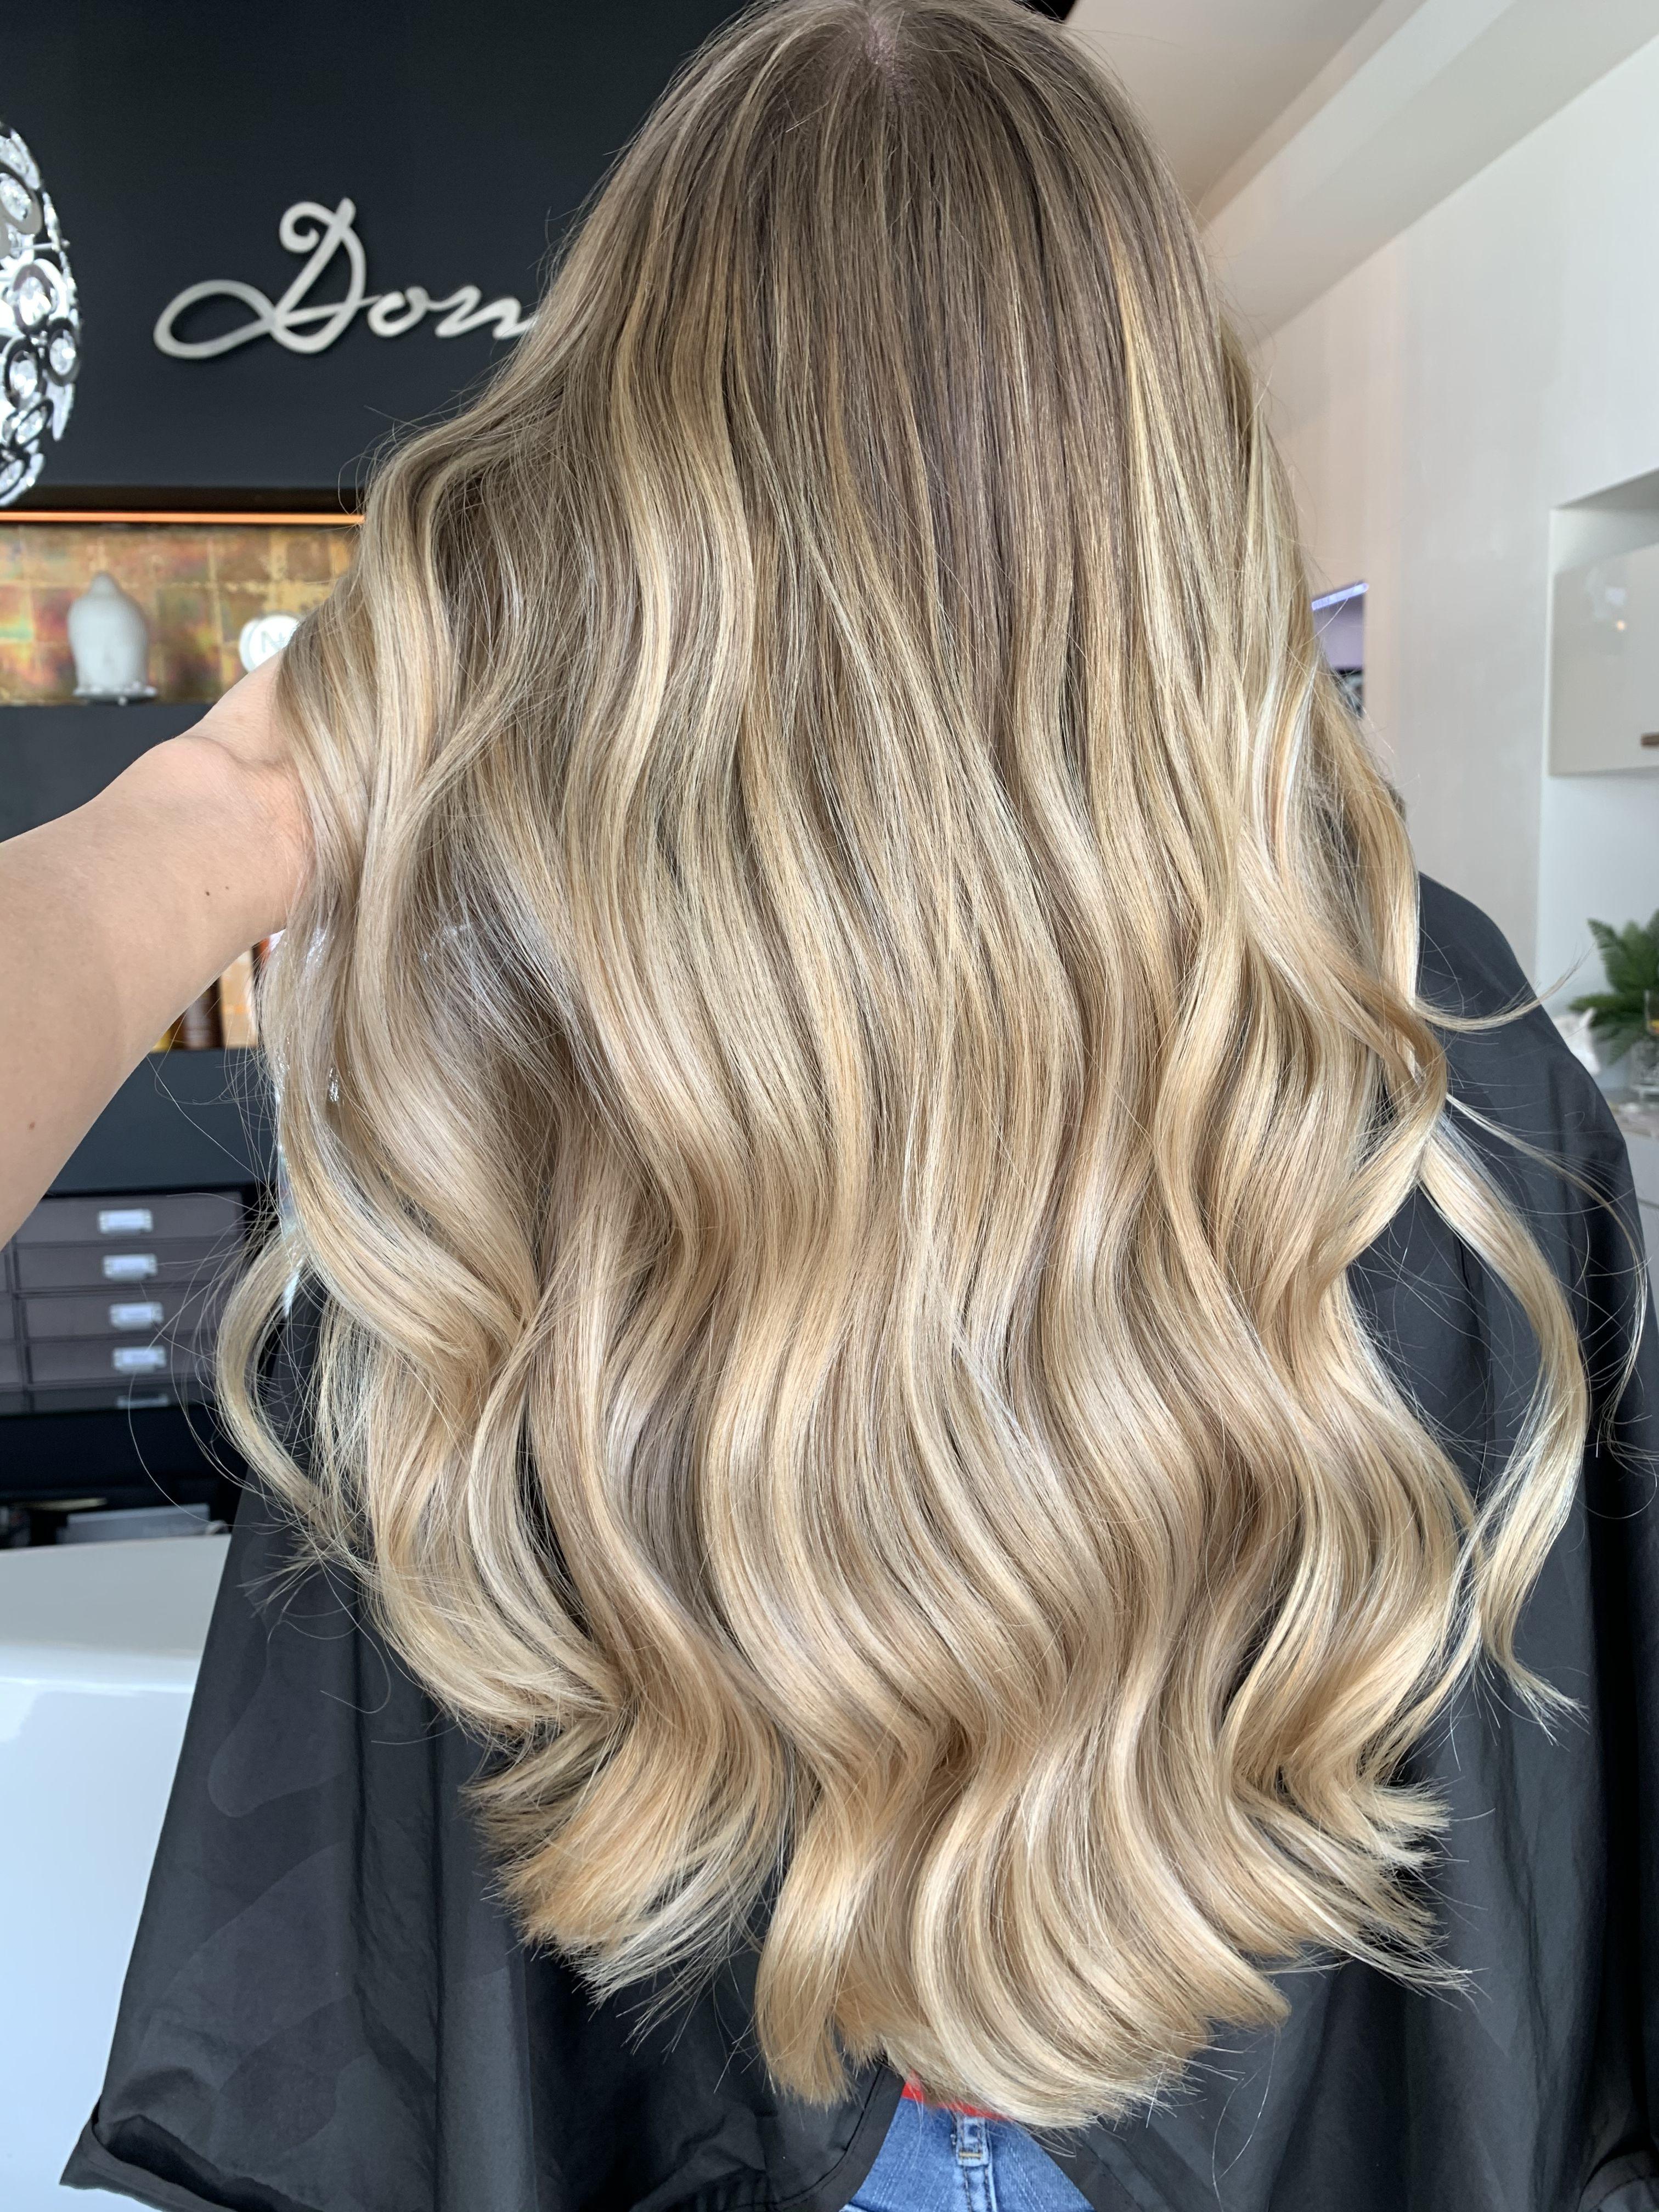 Long Blonde Hair Lange Blonde Haare Highlight Frisuren Frisuren Blond